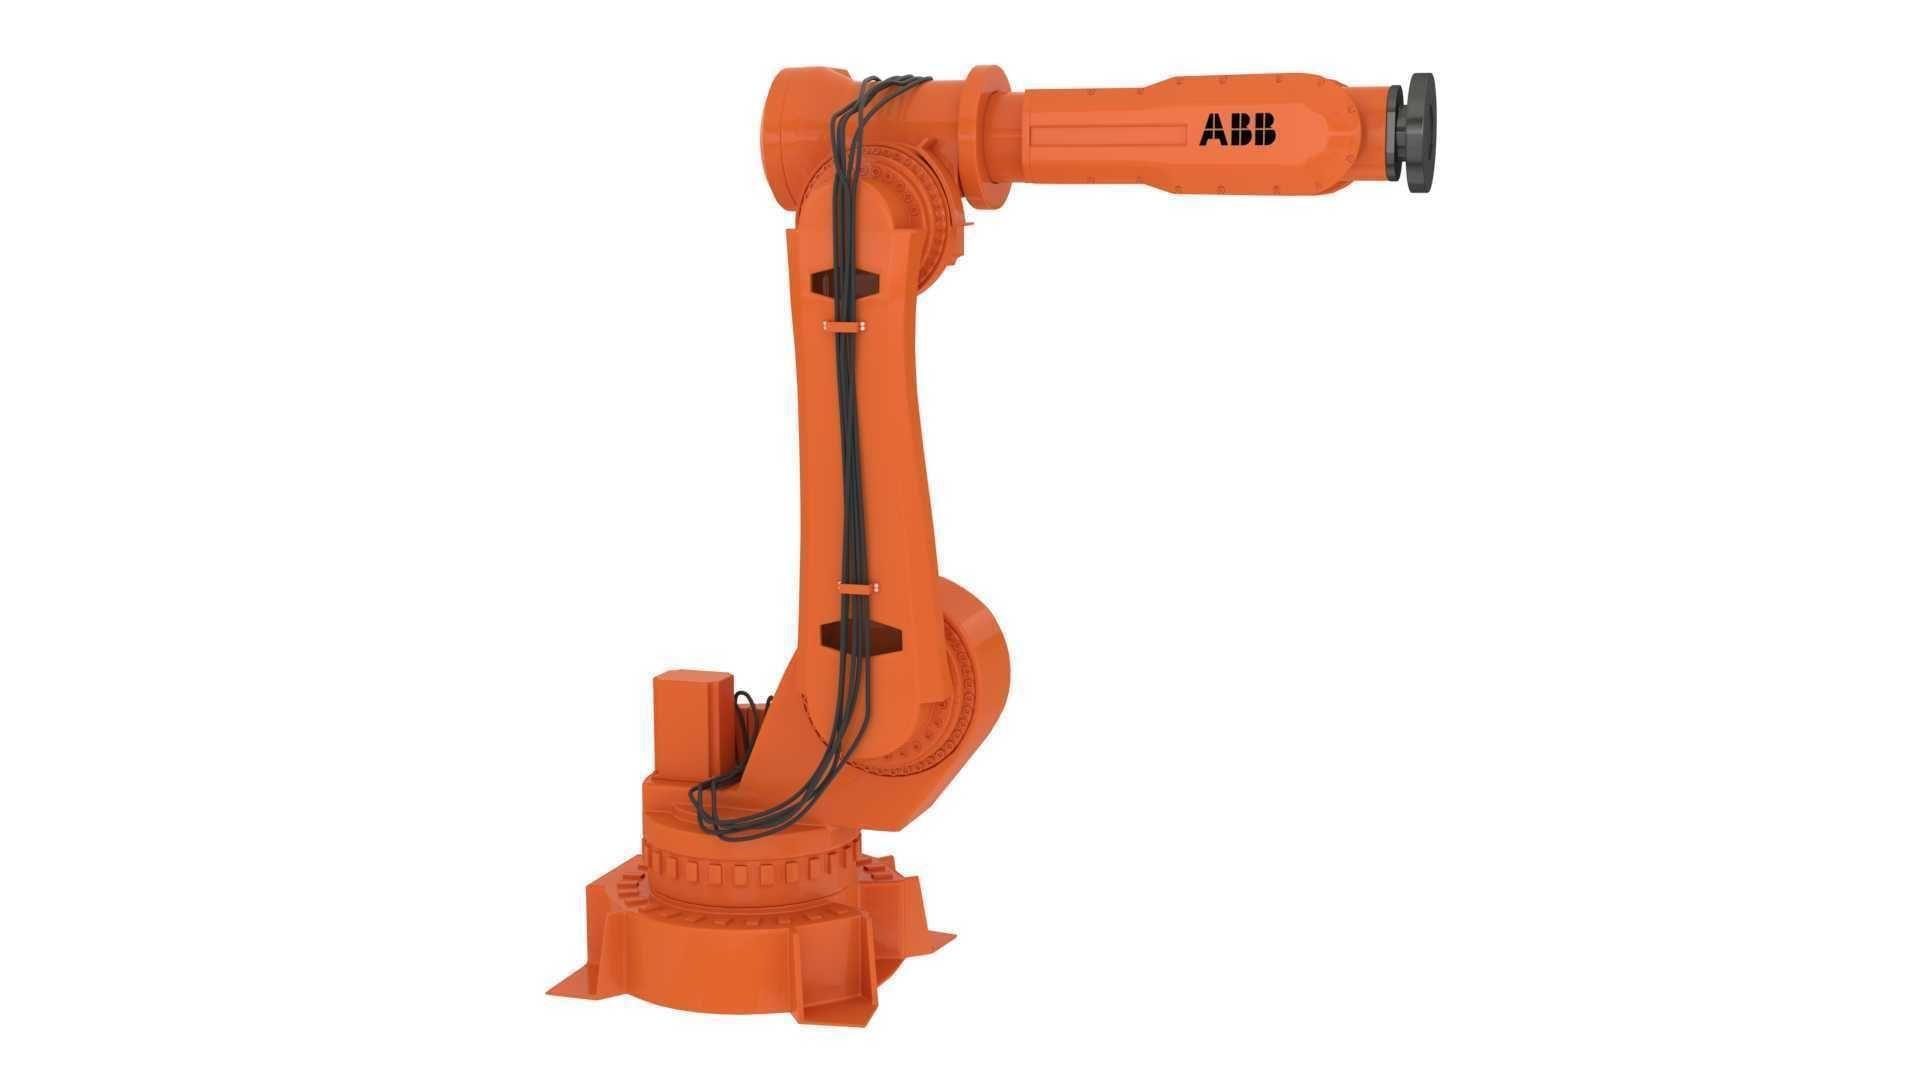 ABB IRB 6620 Industrial Robot